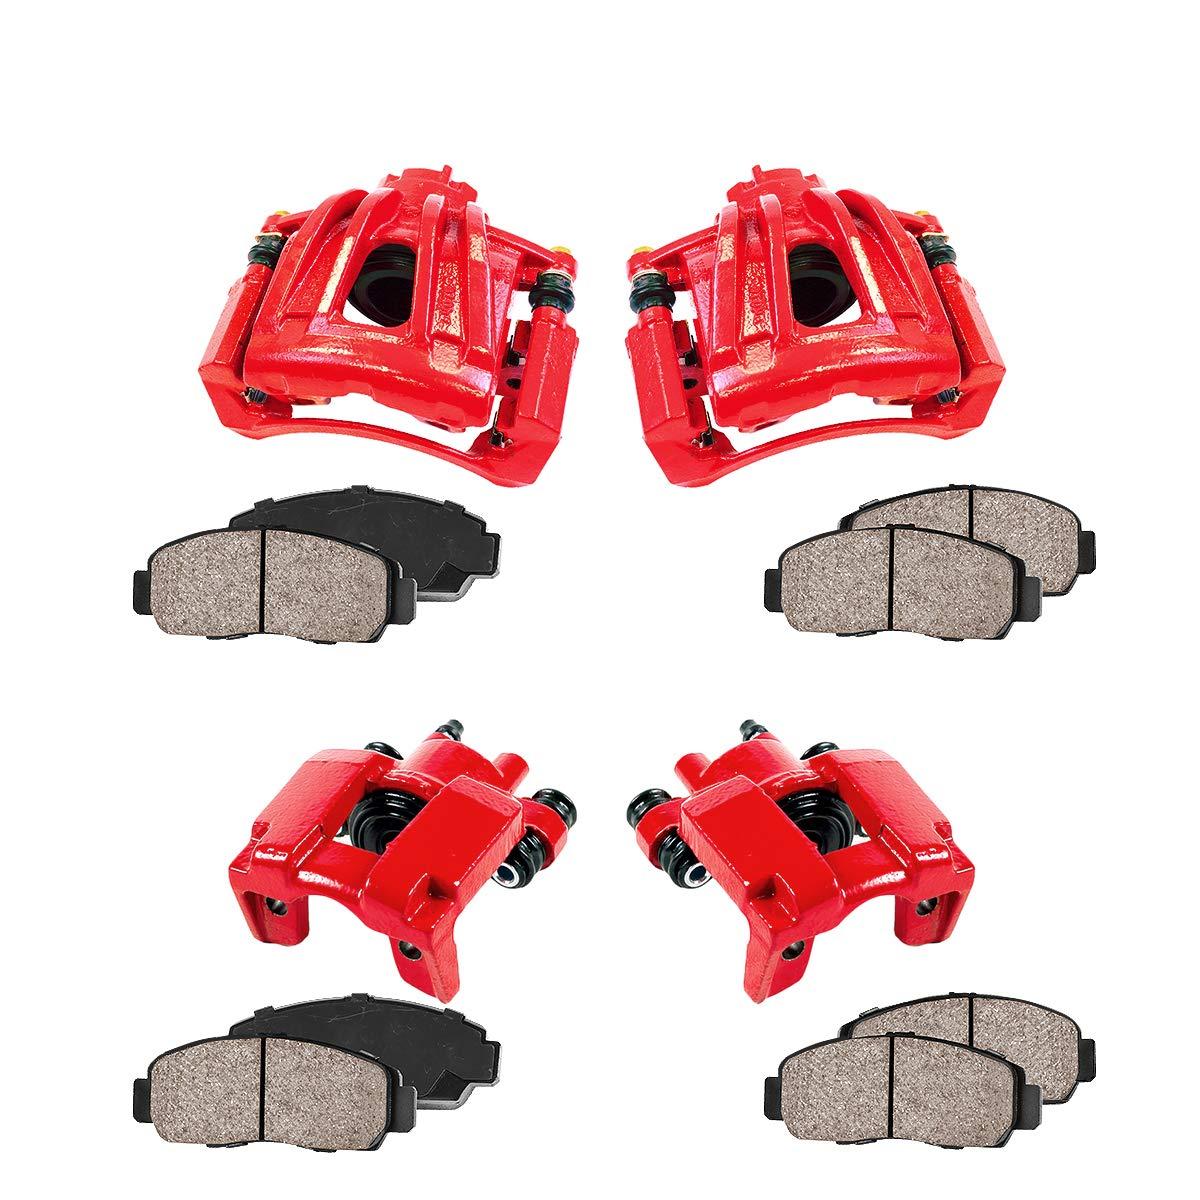 REAR Ceramic Brake Pads Kit 4 Performance Grade Semi-Loaded Powder Coated Red Caliper Callahan CCK12051 FRONT